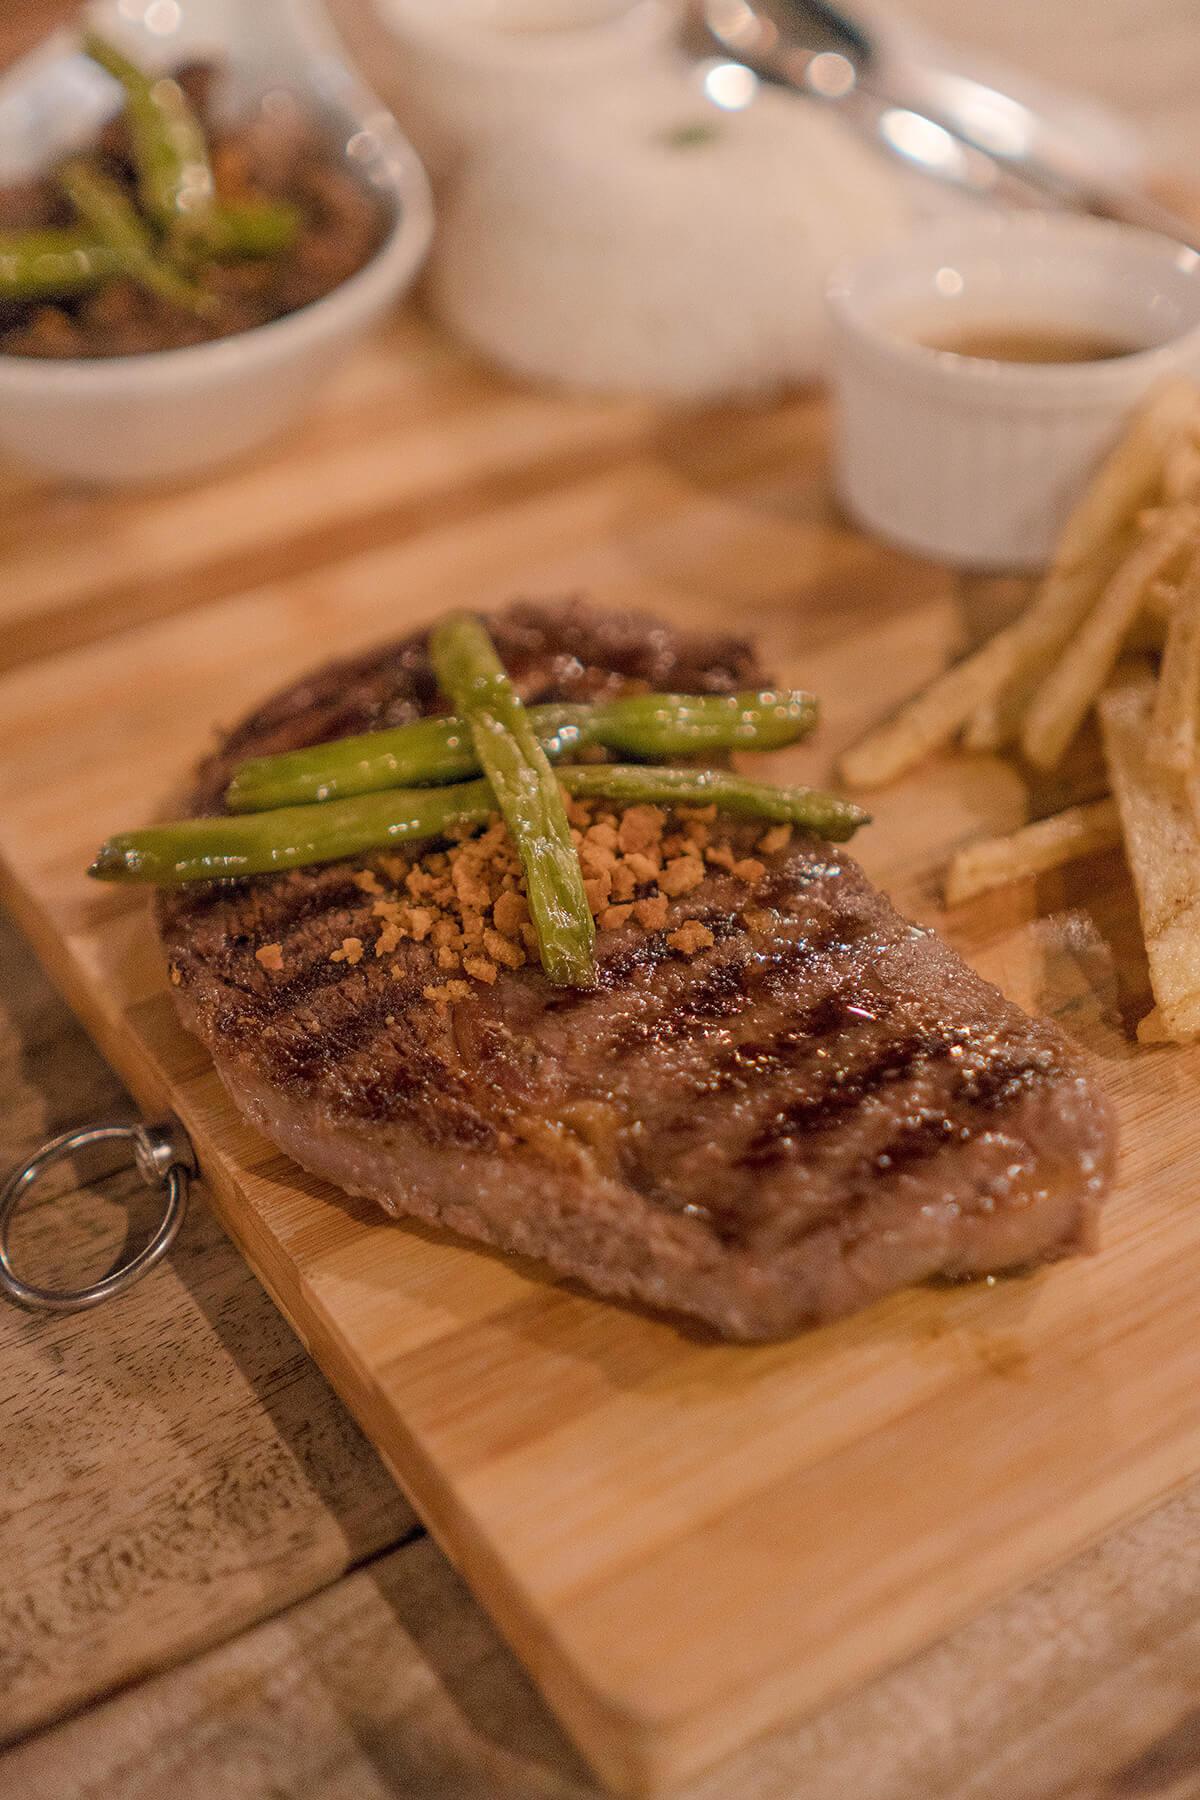 Beach Bum Food Park La Union Rustic Box Steak